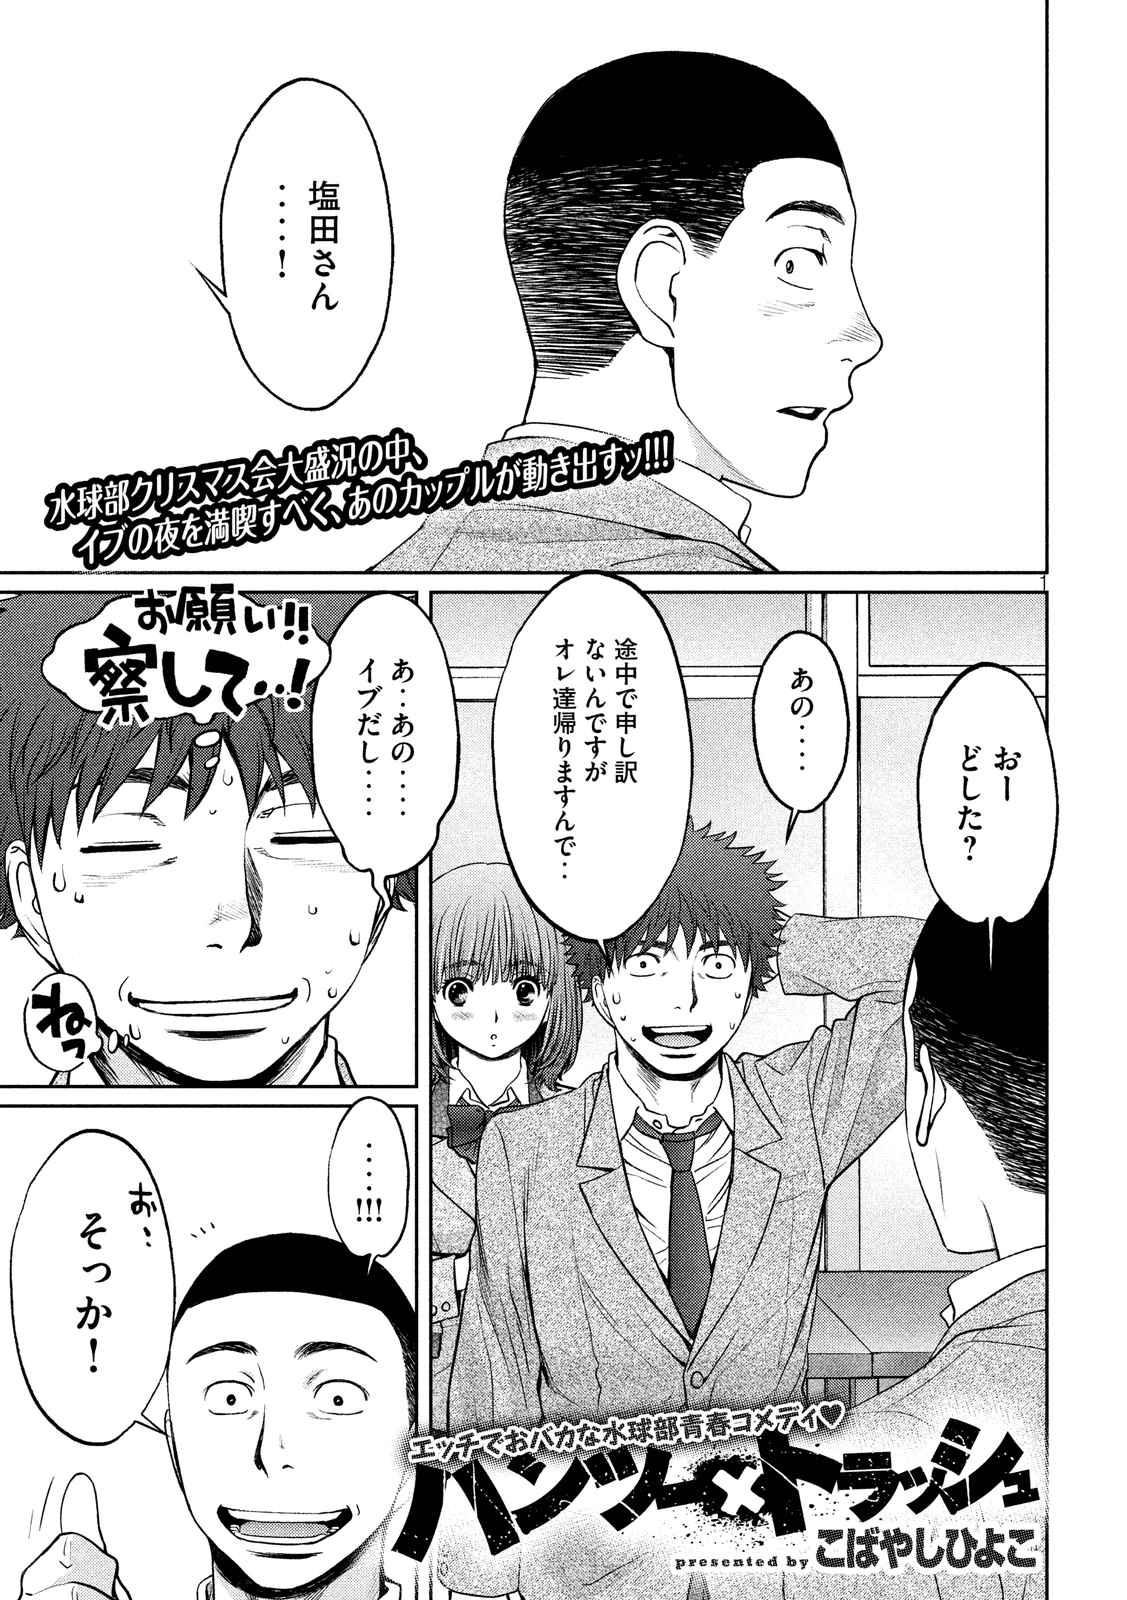 Hantsu_x_Trash Chapter 128 Page 1